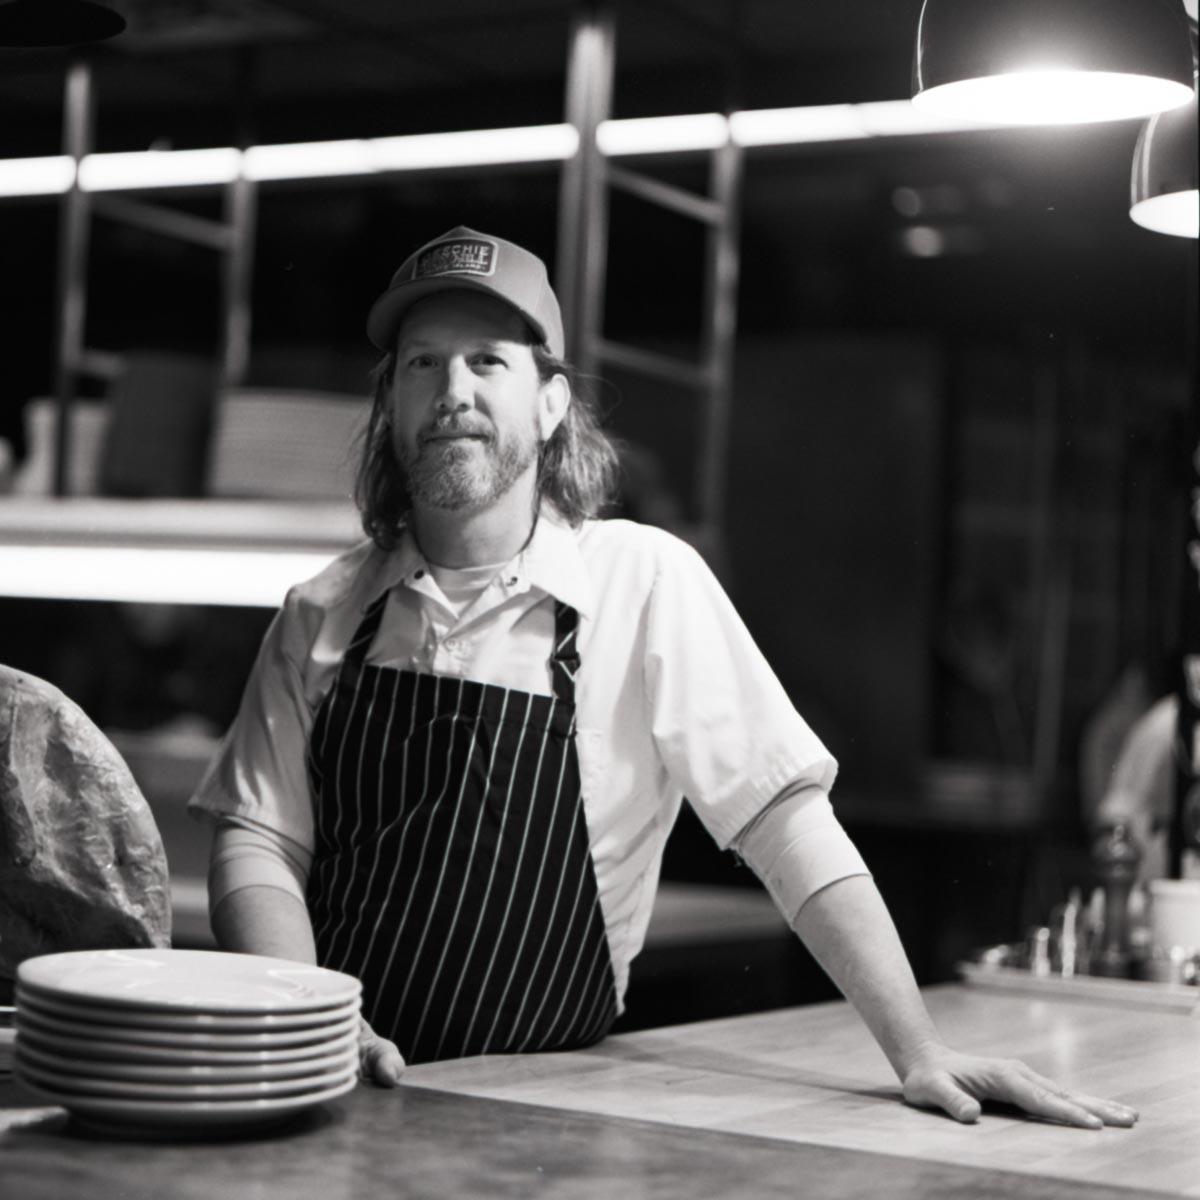 Chef Shawn Burnette